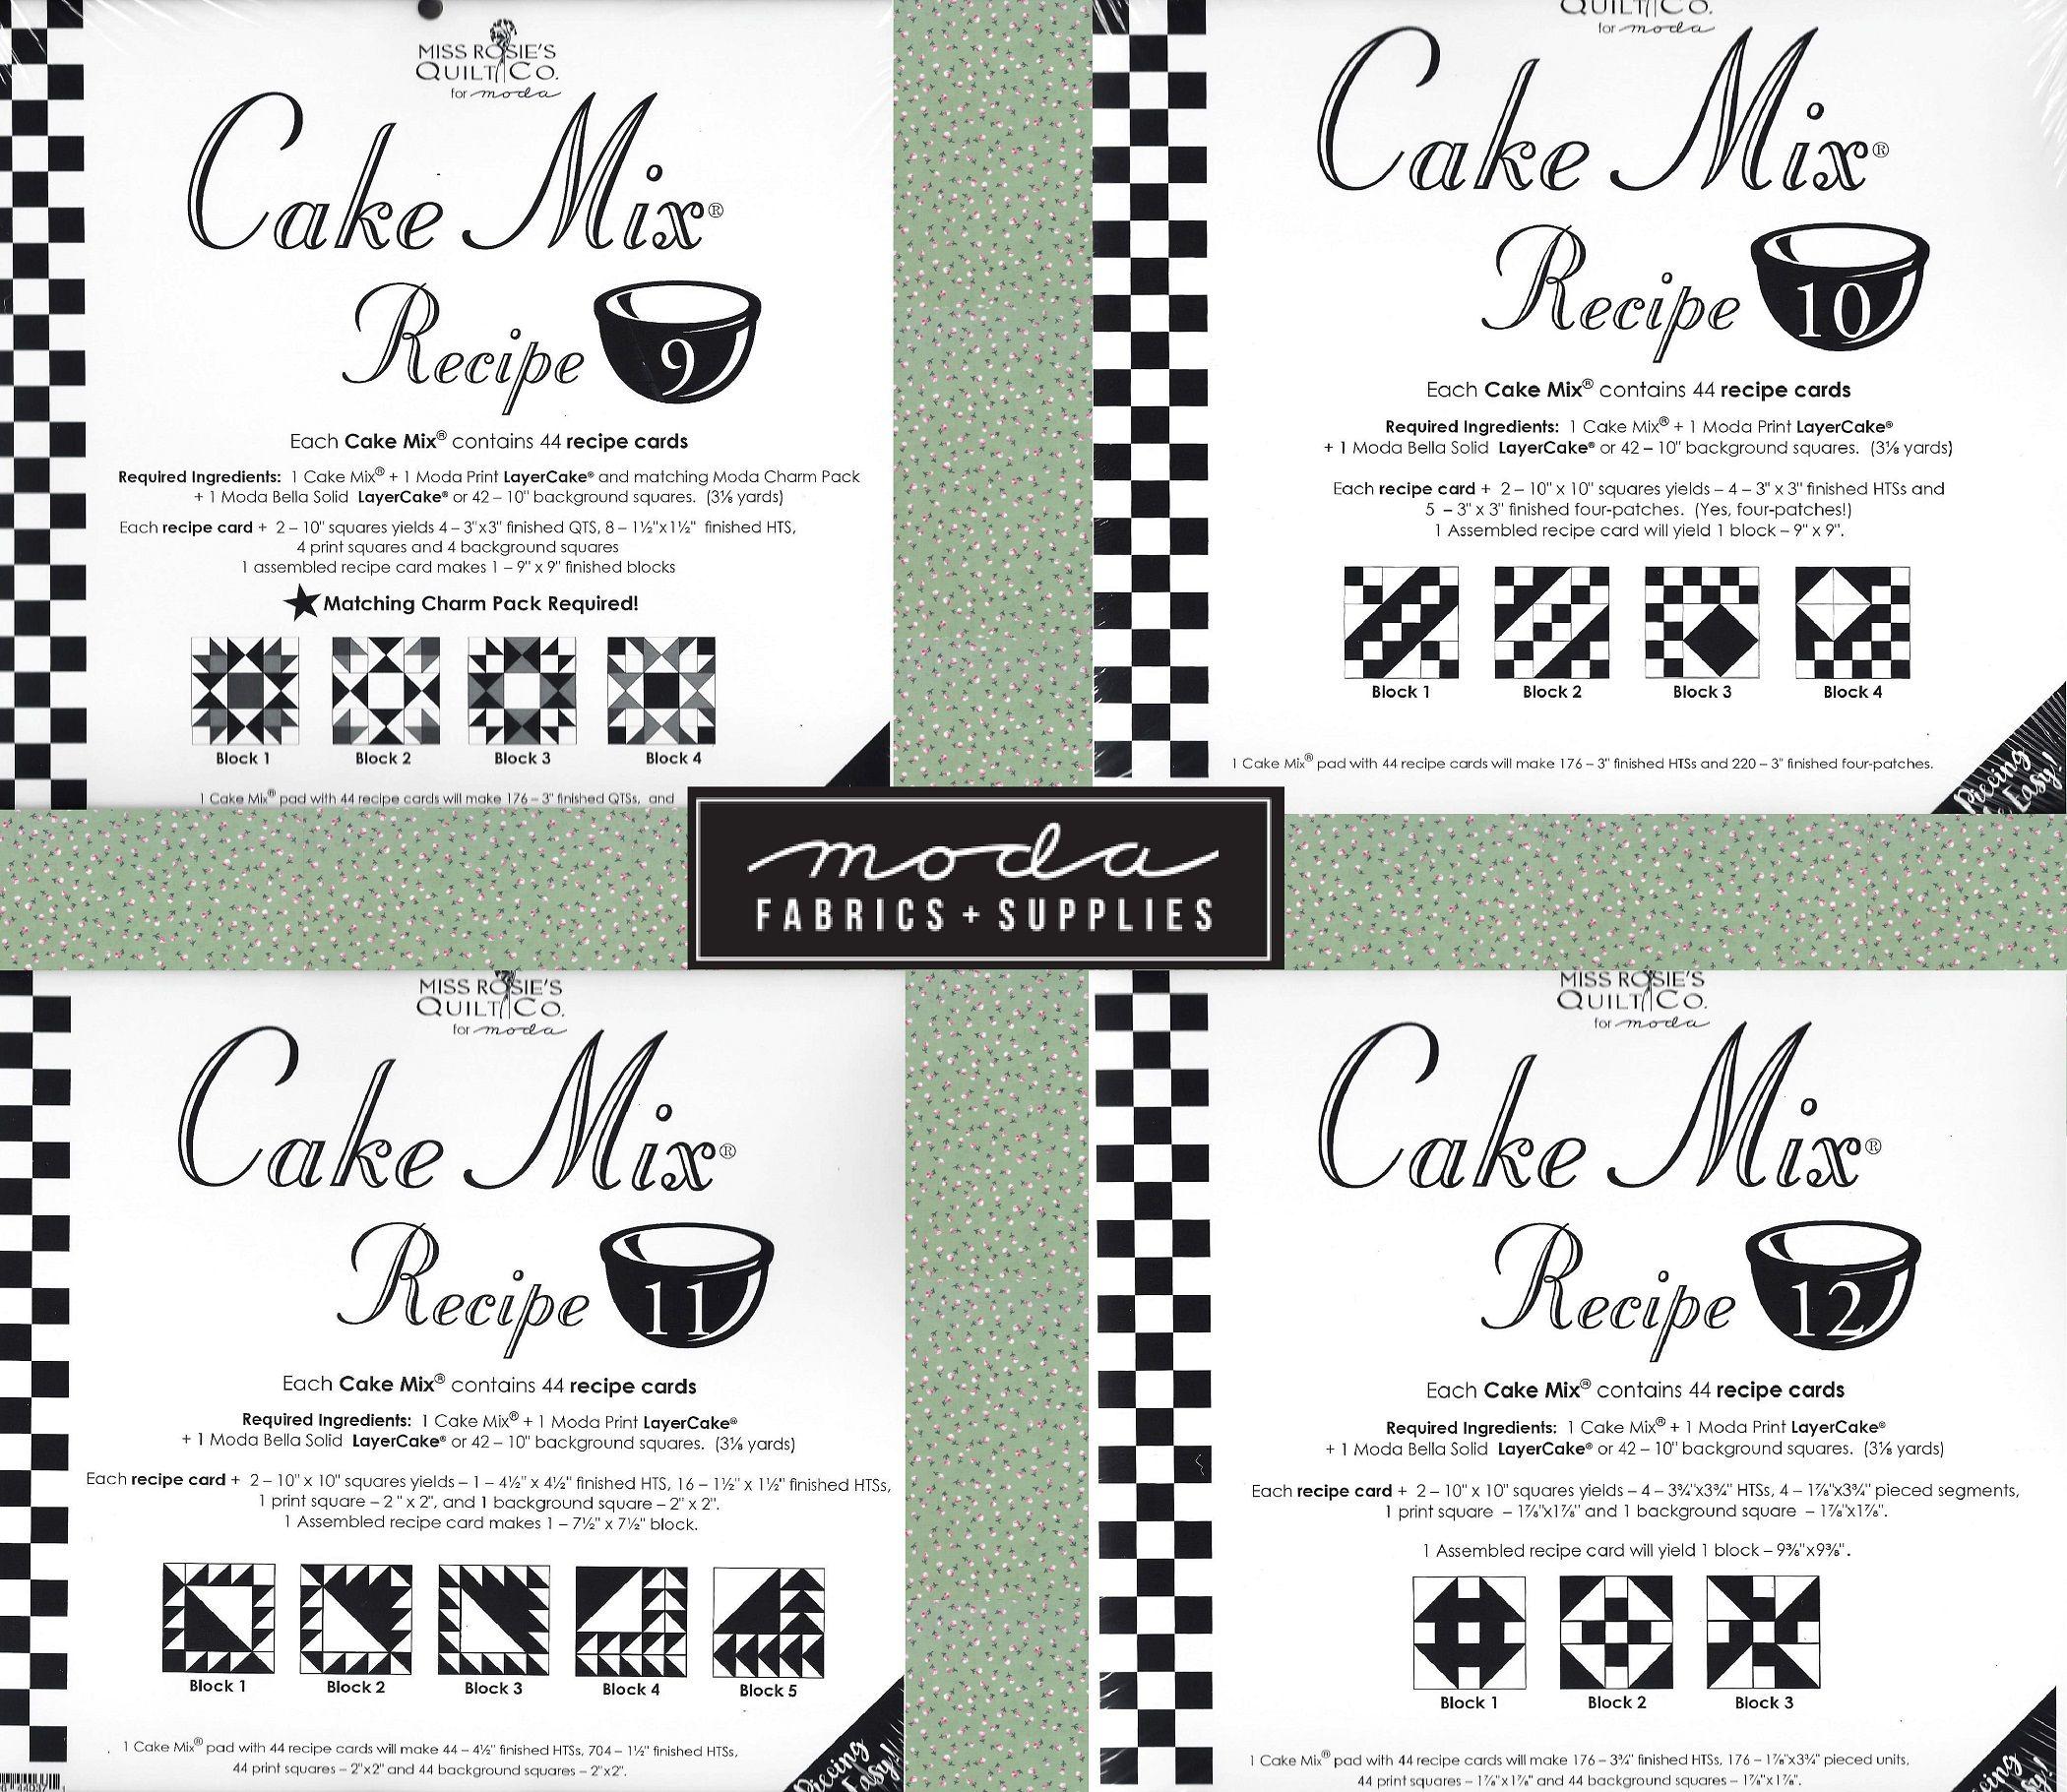 Cake Mix Recipe 6 Miss Rosies Quilt Co